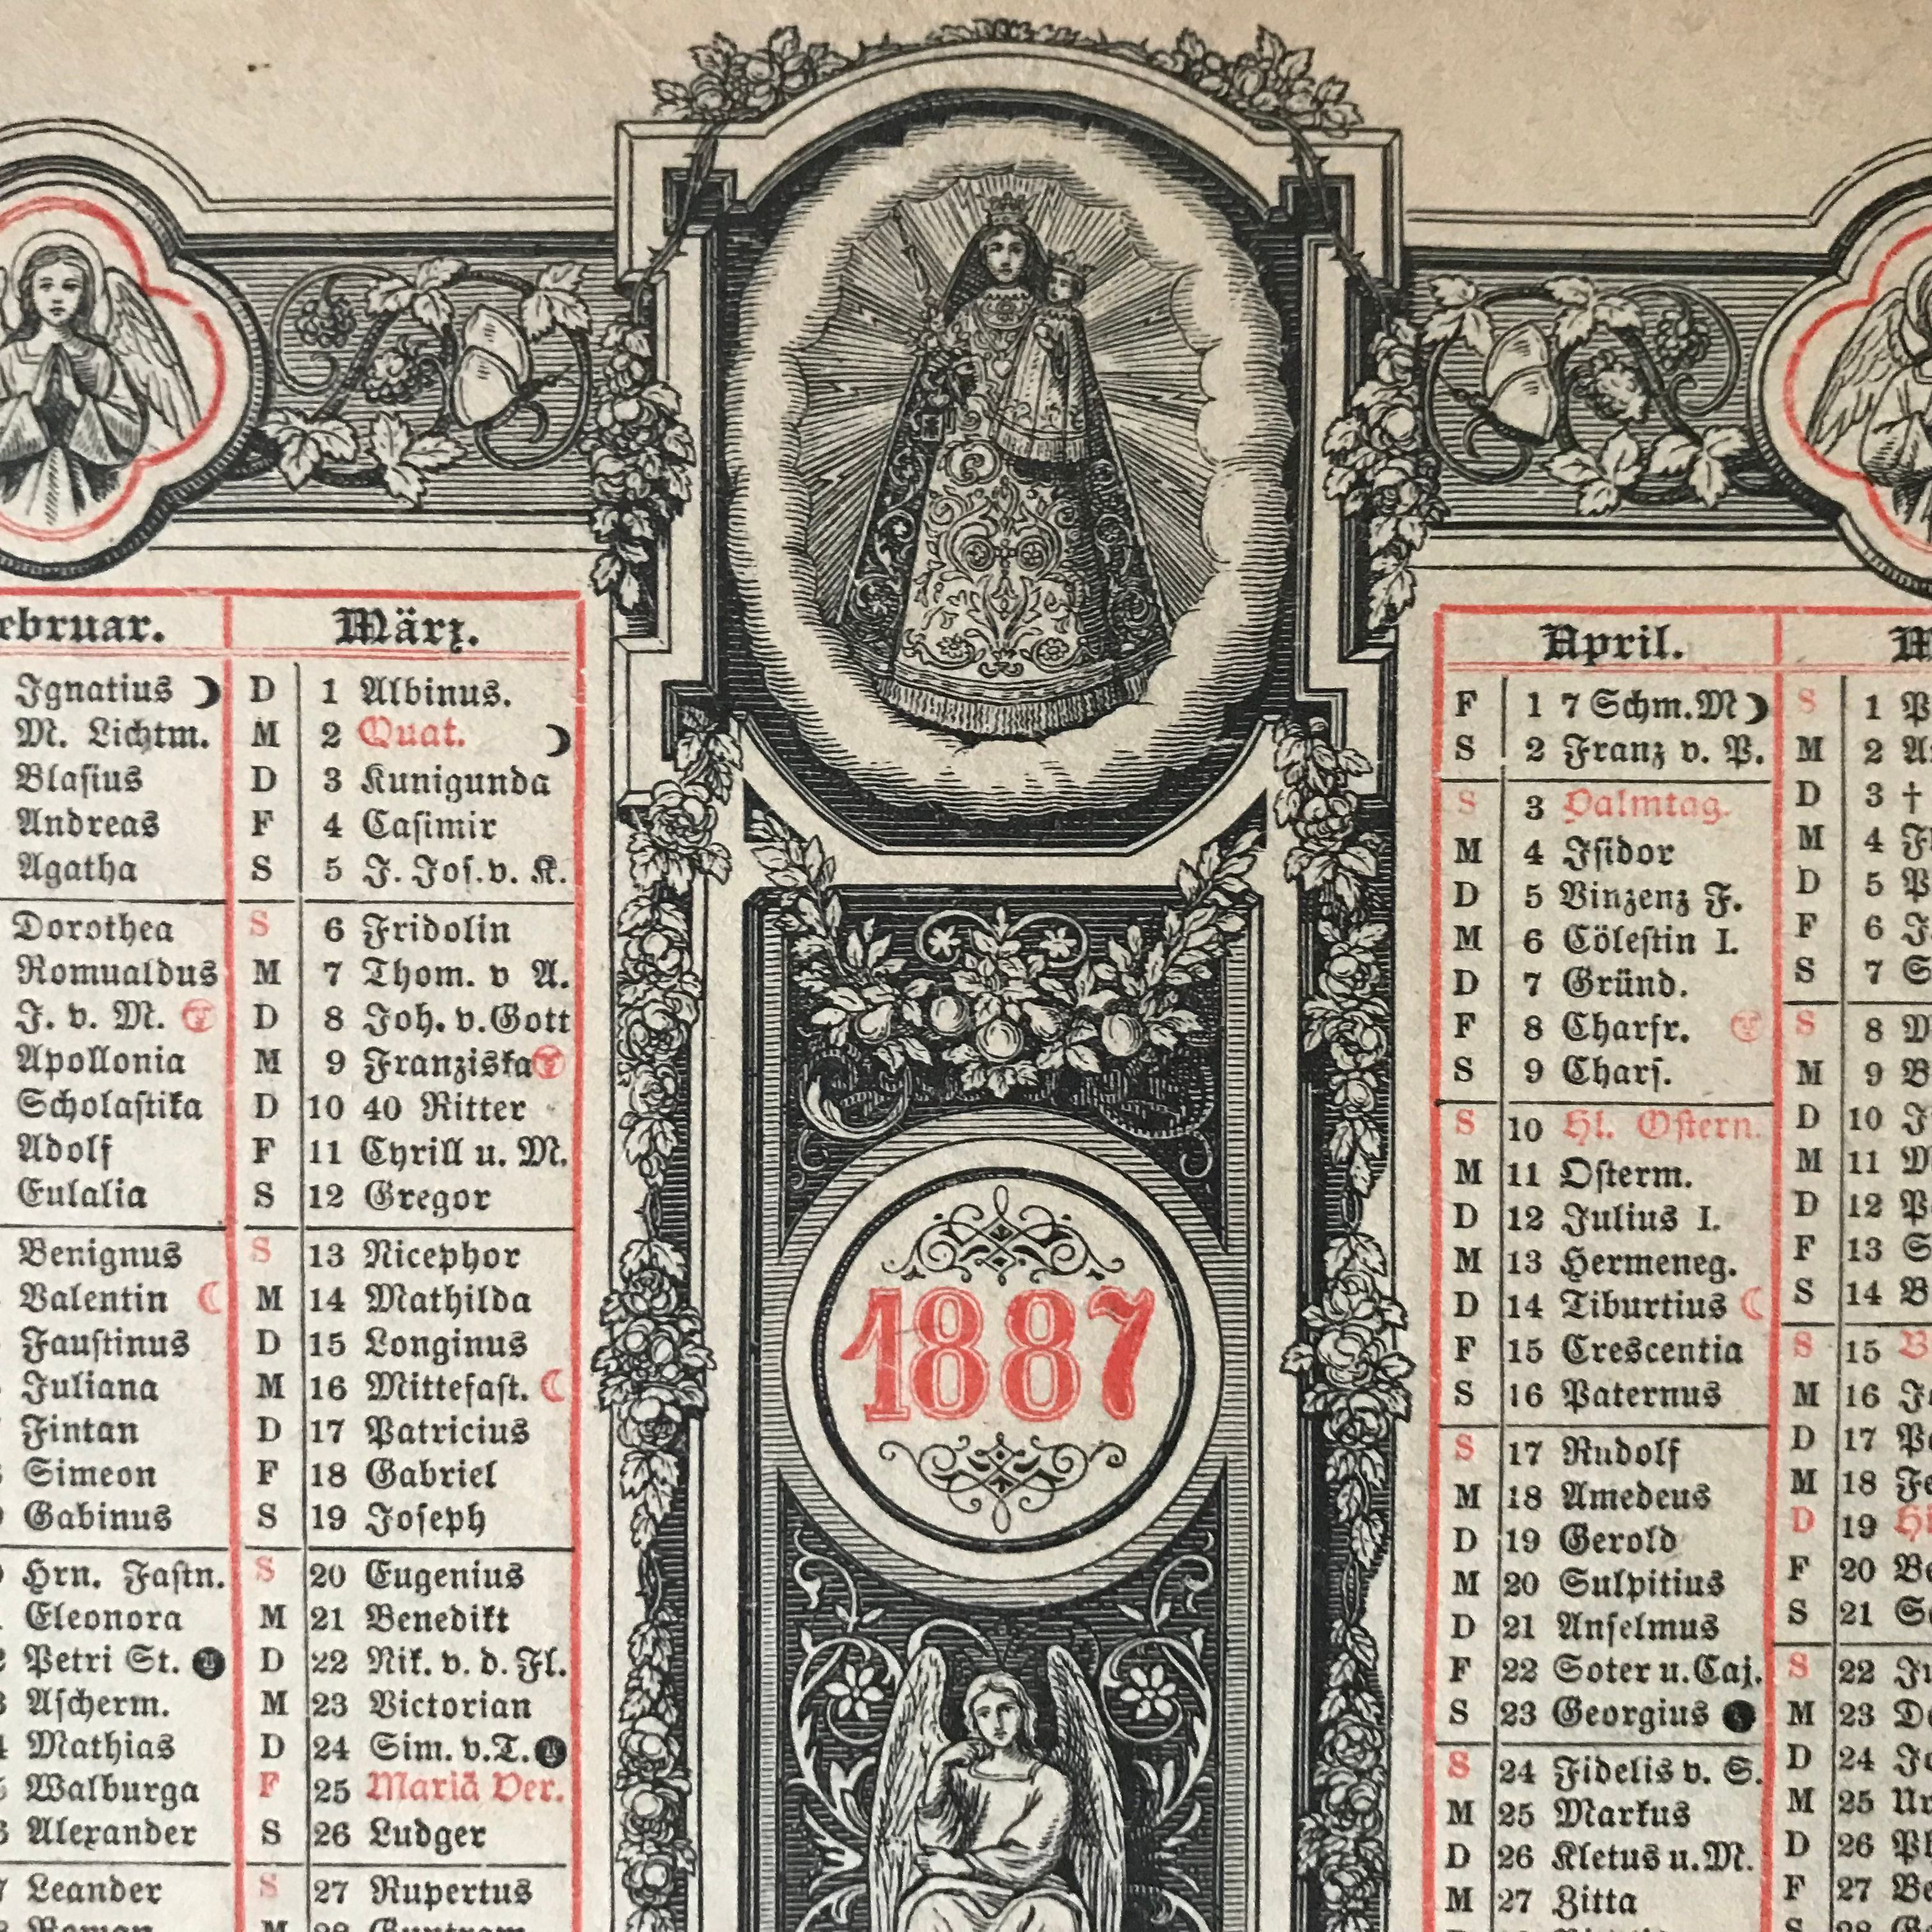 1887 Liturgical Calendar Of Saints Feast Days With Roman Catholic Saint Days Calendar